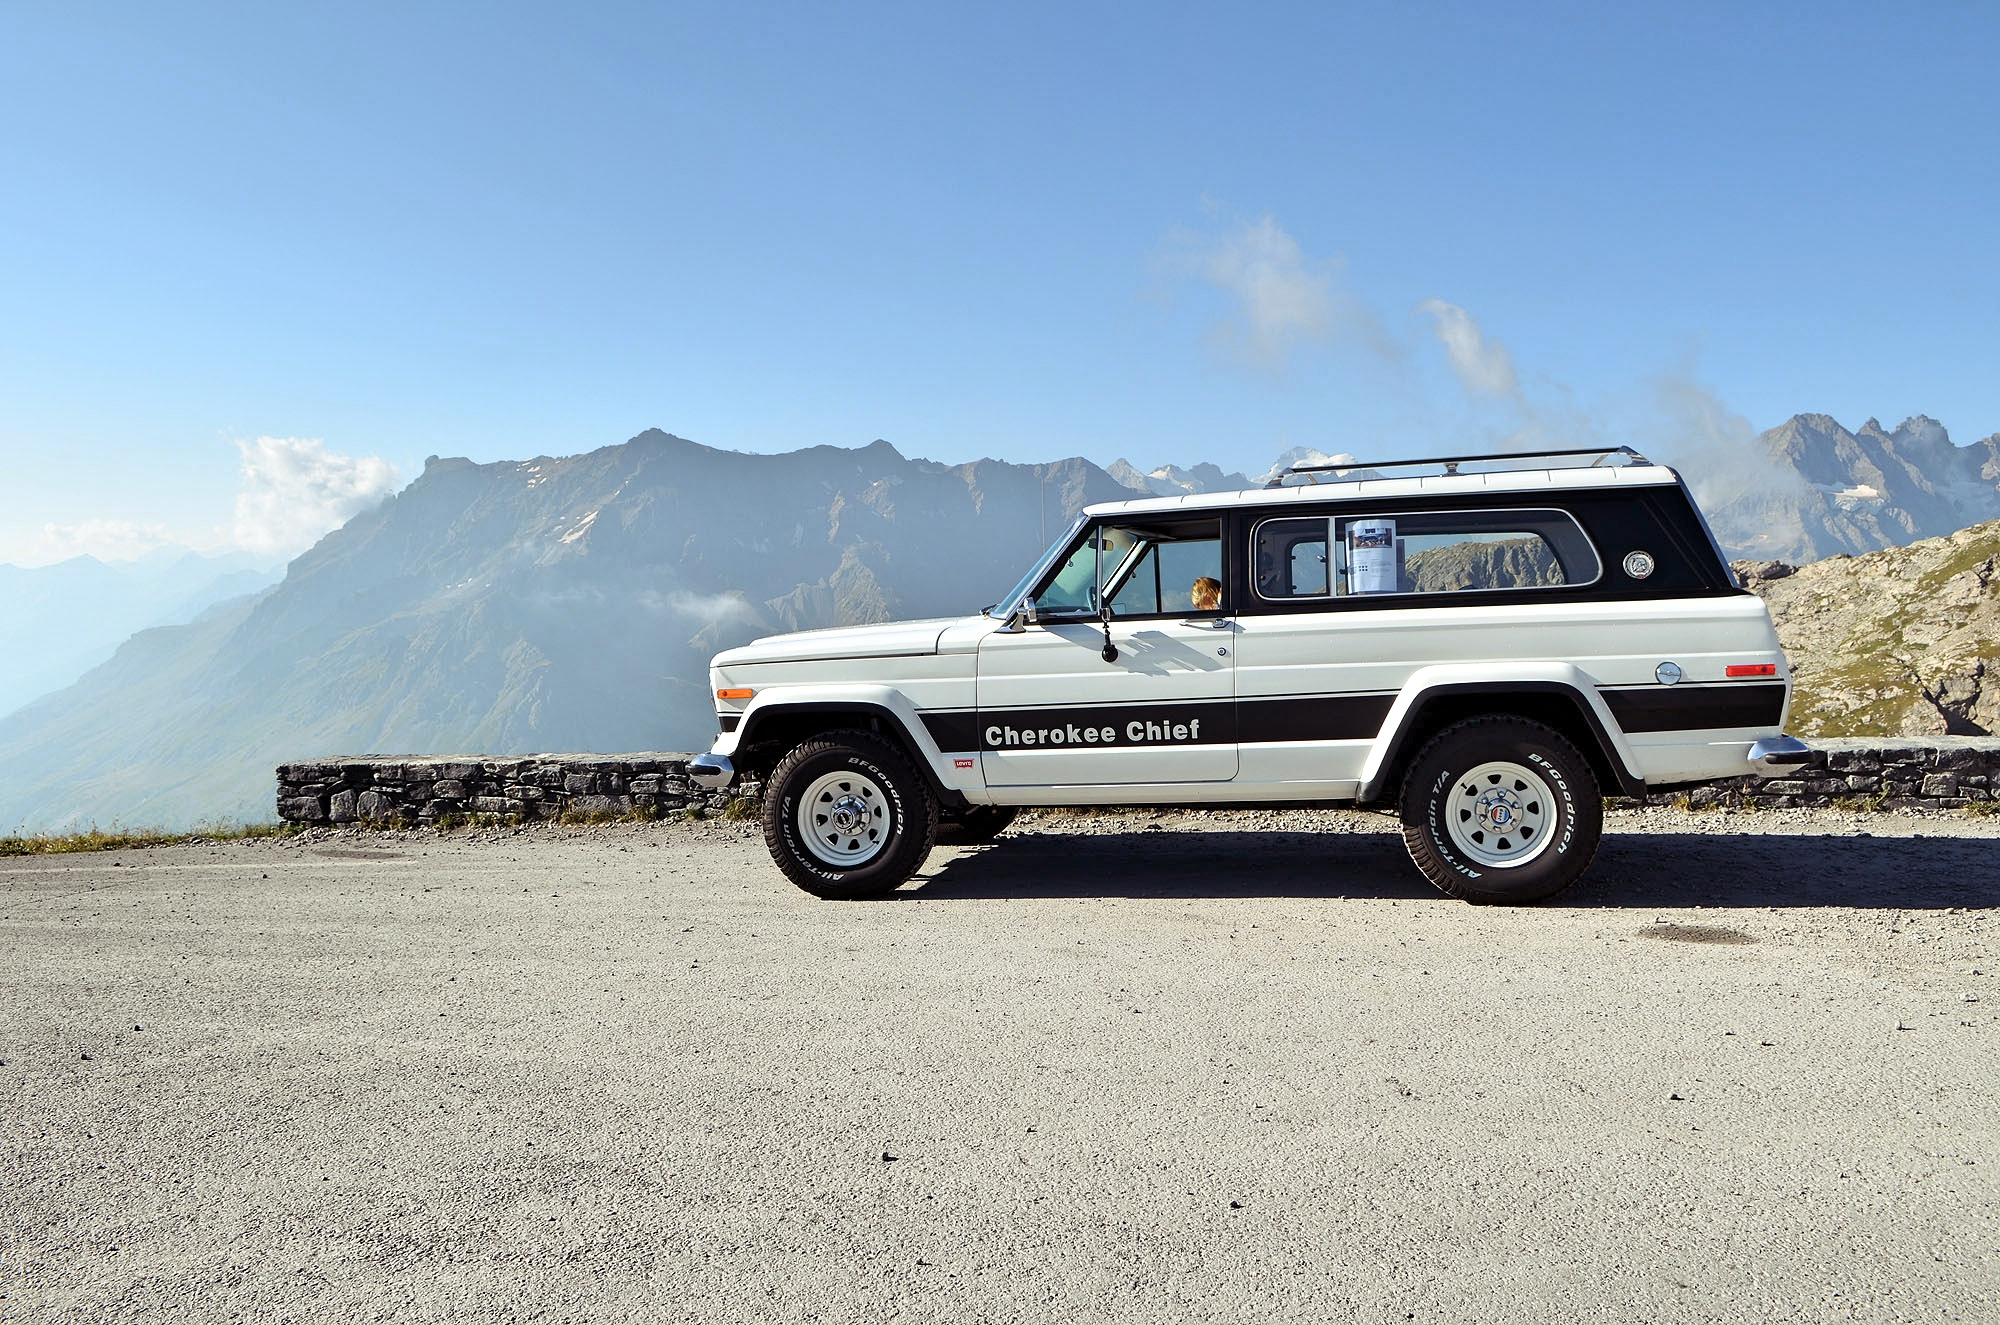 jeep-cherokee-chief-valloire-101.JPG